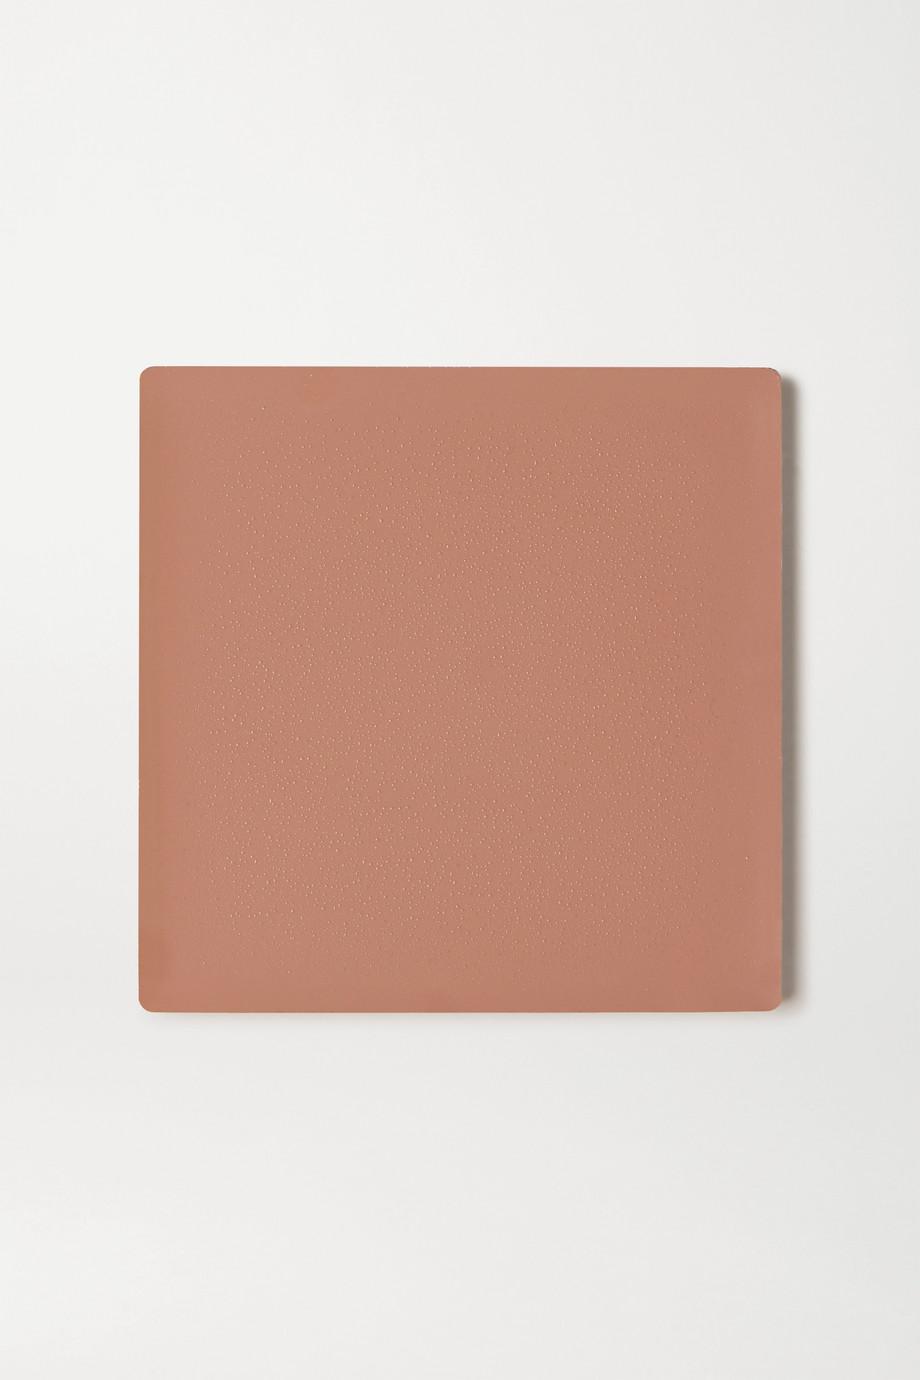 Kjaer Weis Cream Foundation Refill - Just Sheer